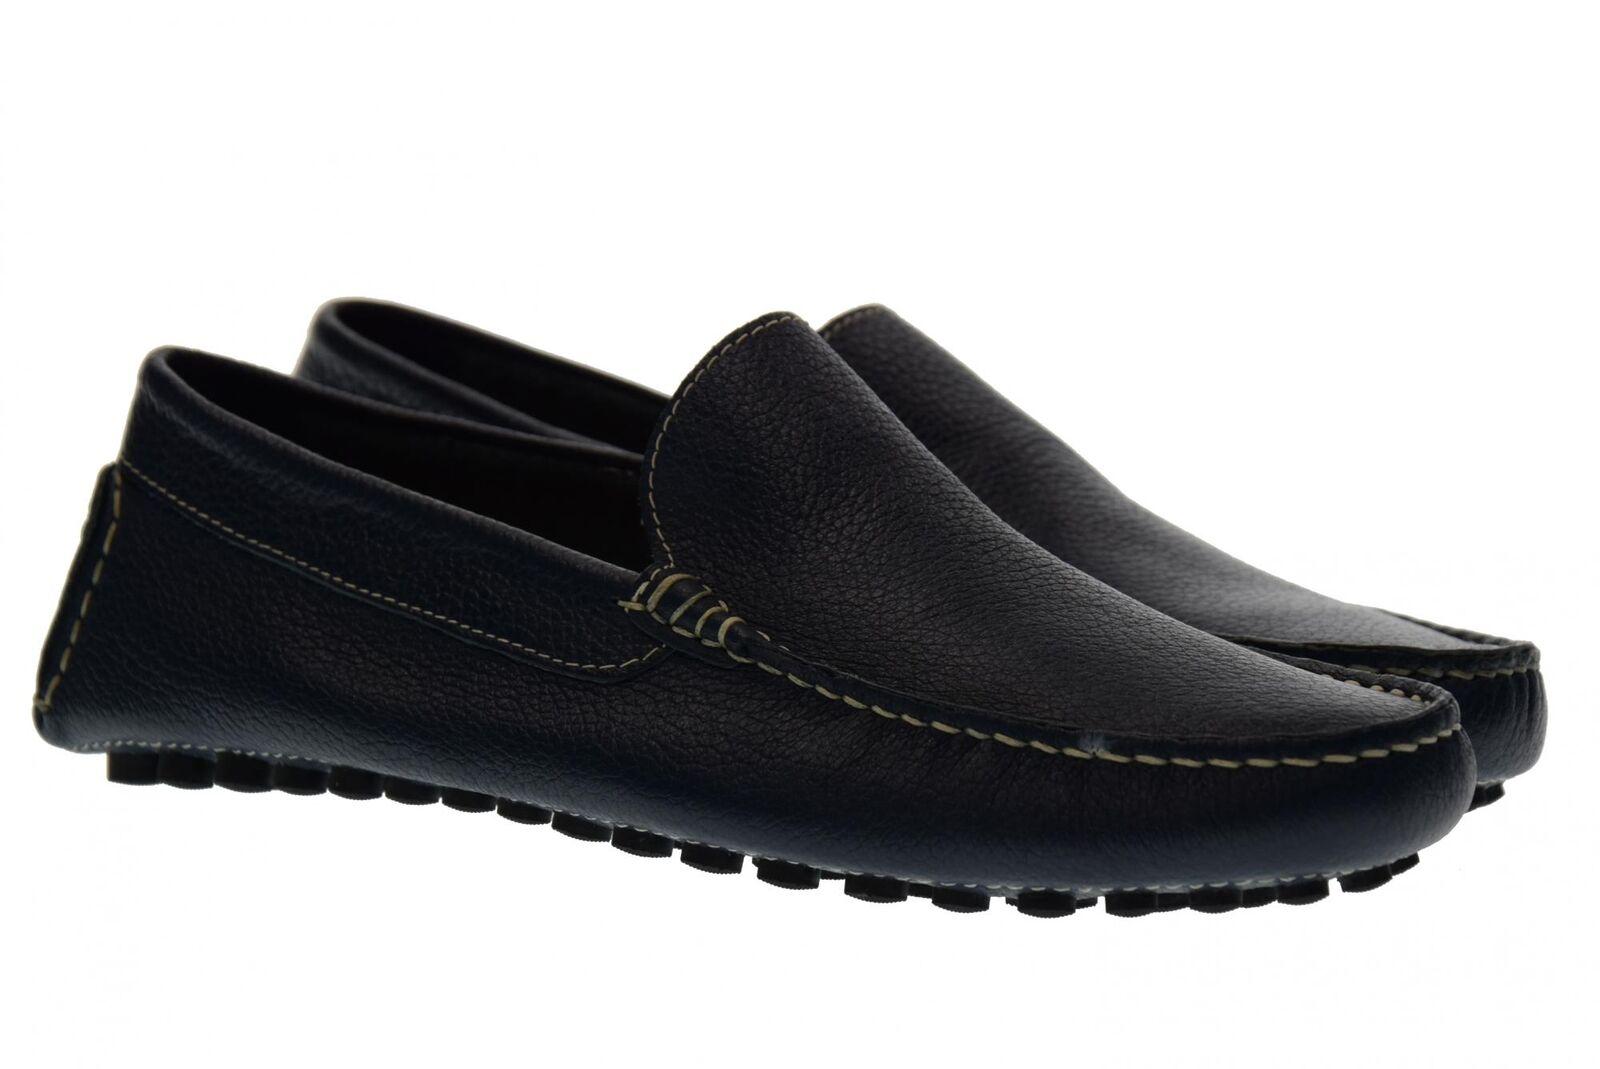 Antica Cuoieria holgazanes del hombre de los shoes 20109-V-V03 Vela blue P18s